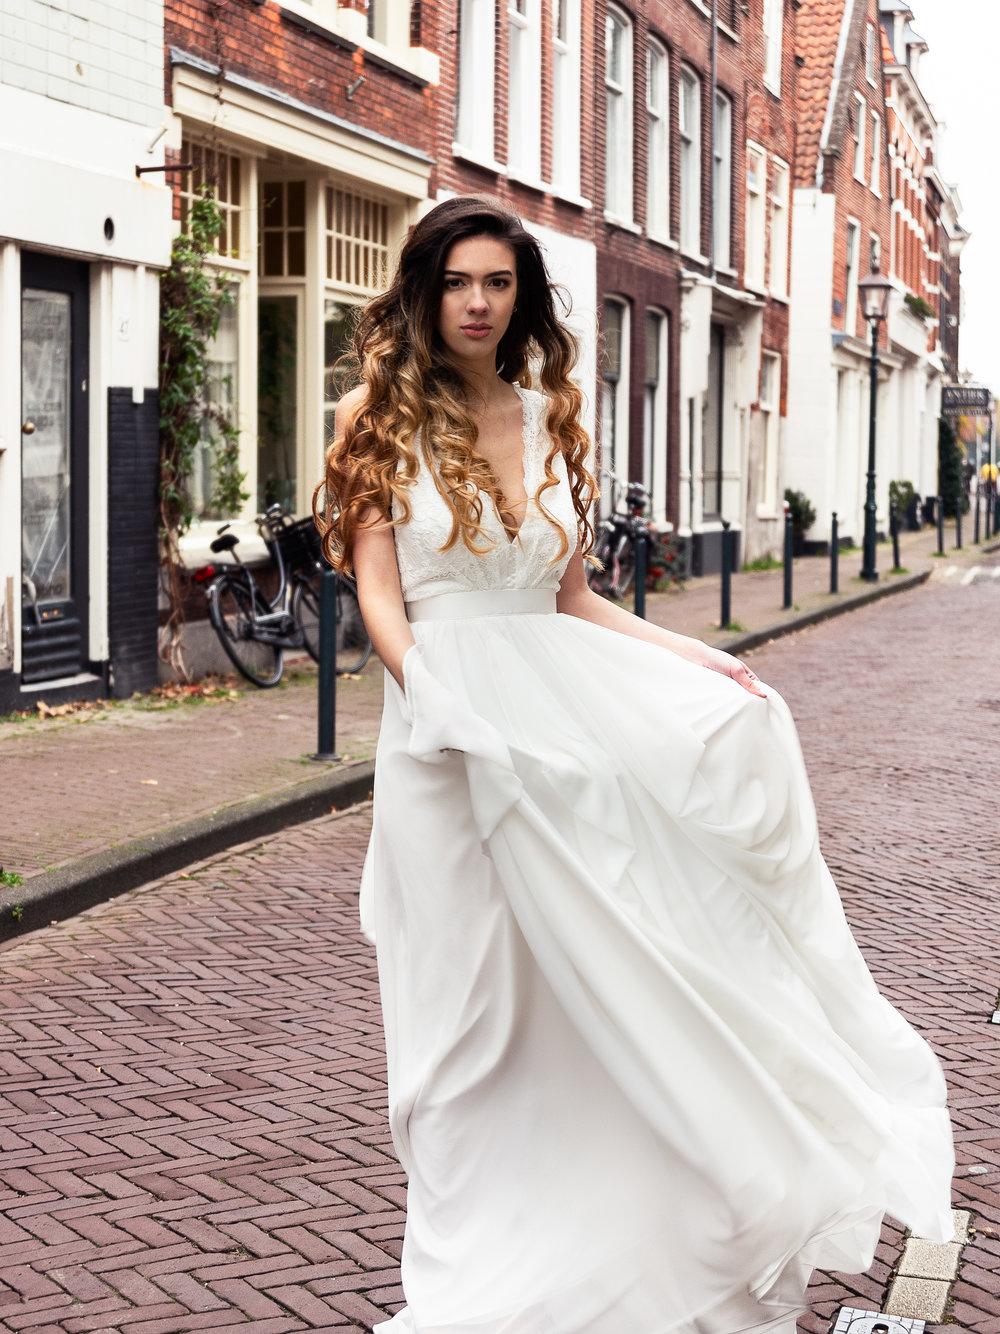 styled-bridal-22.jpg